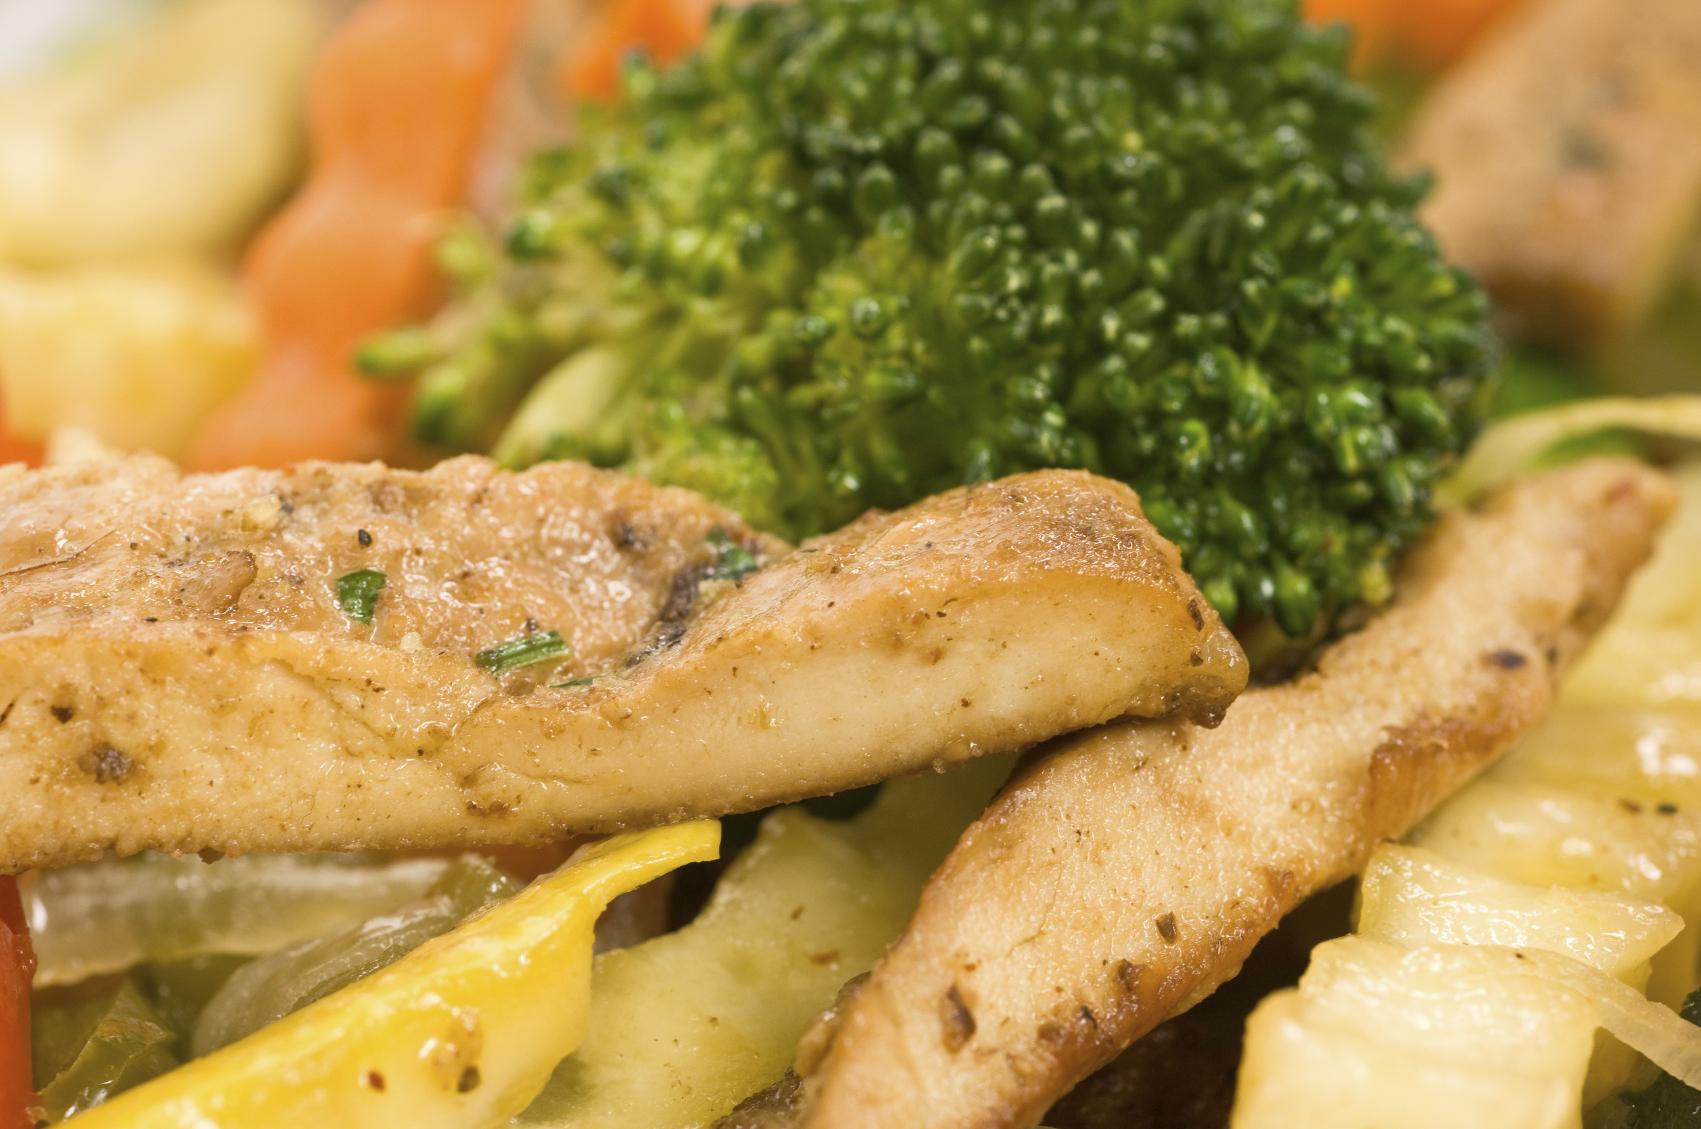 Vegetales al vapor con pechuga de pollo